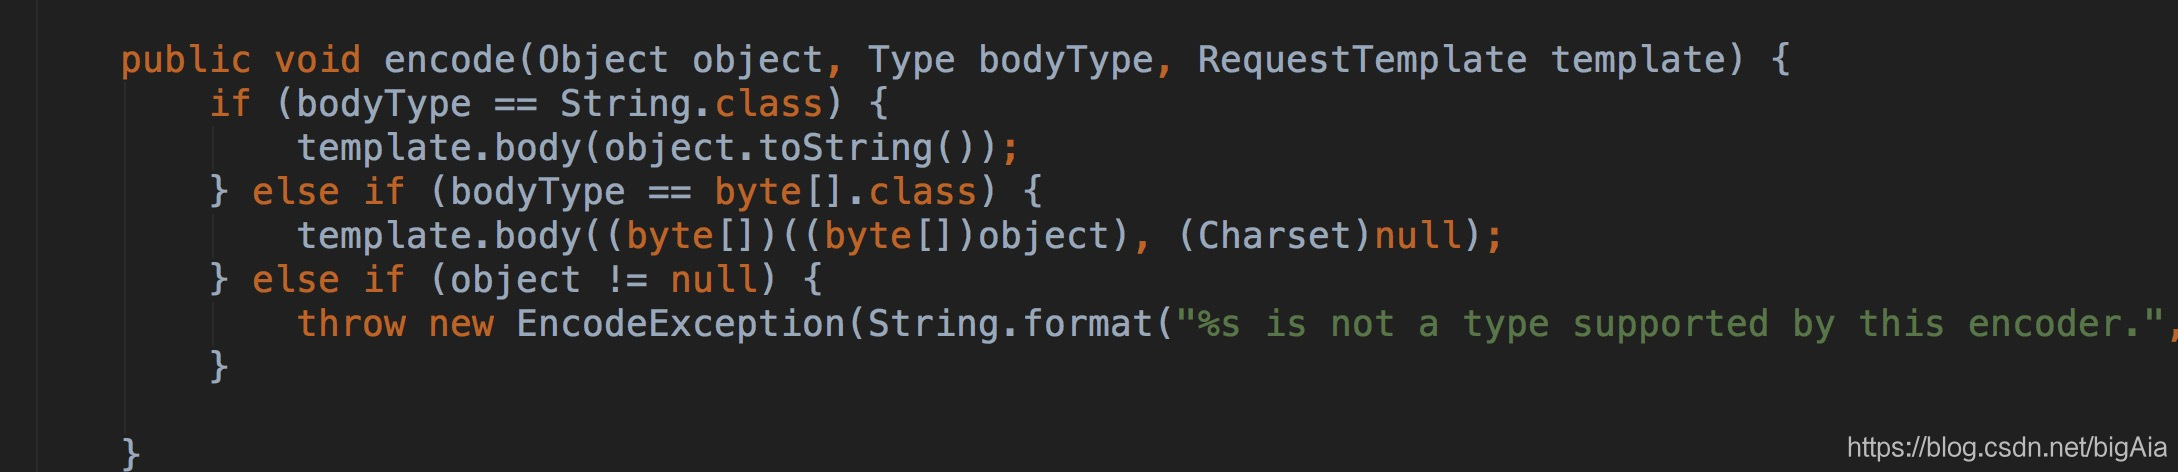 Encoder.Default.encode